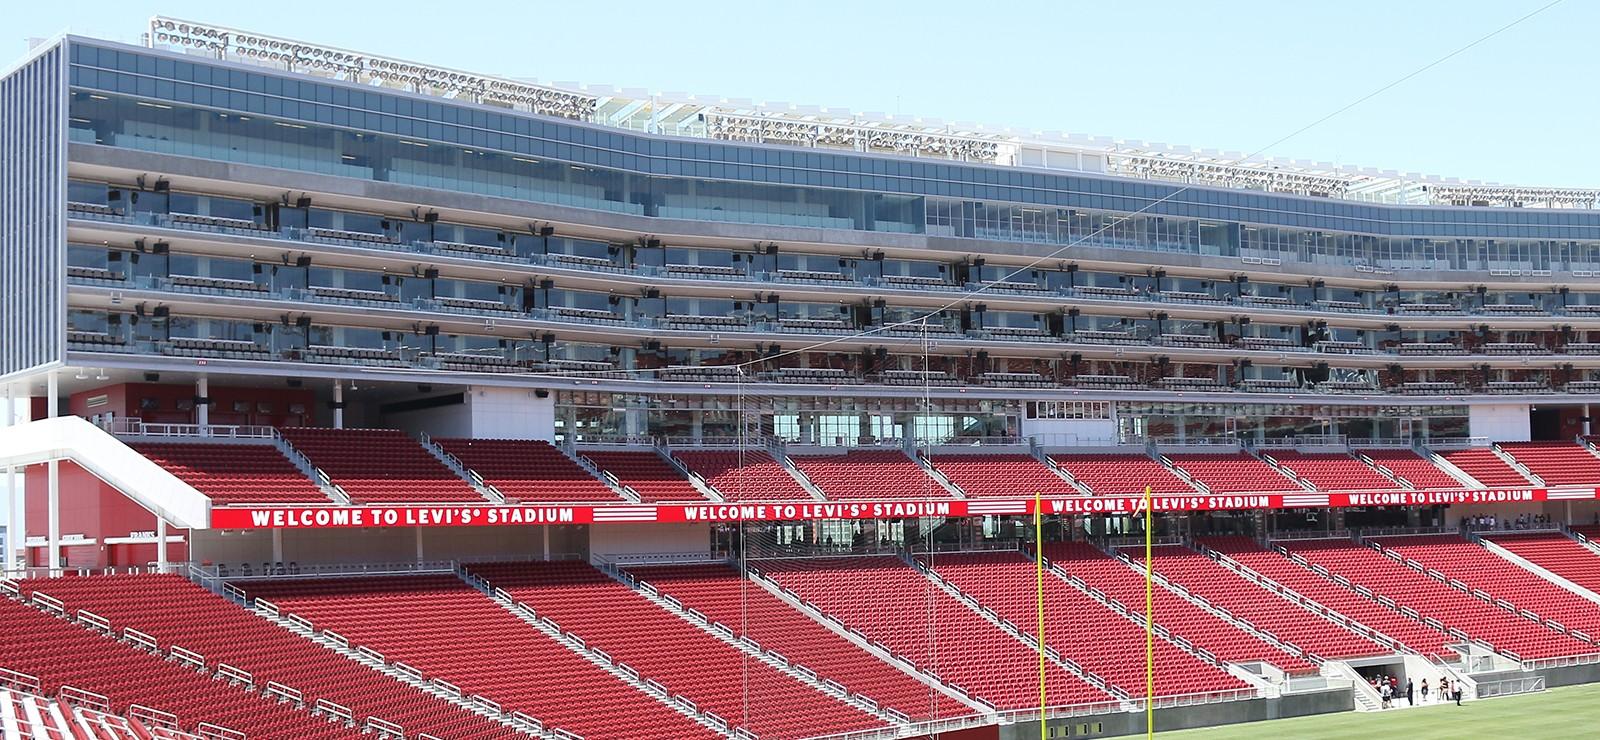 levi's® stadium configuration built for 49ers offensive, defensive